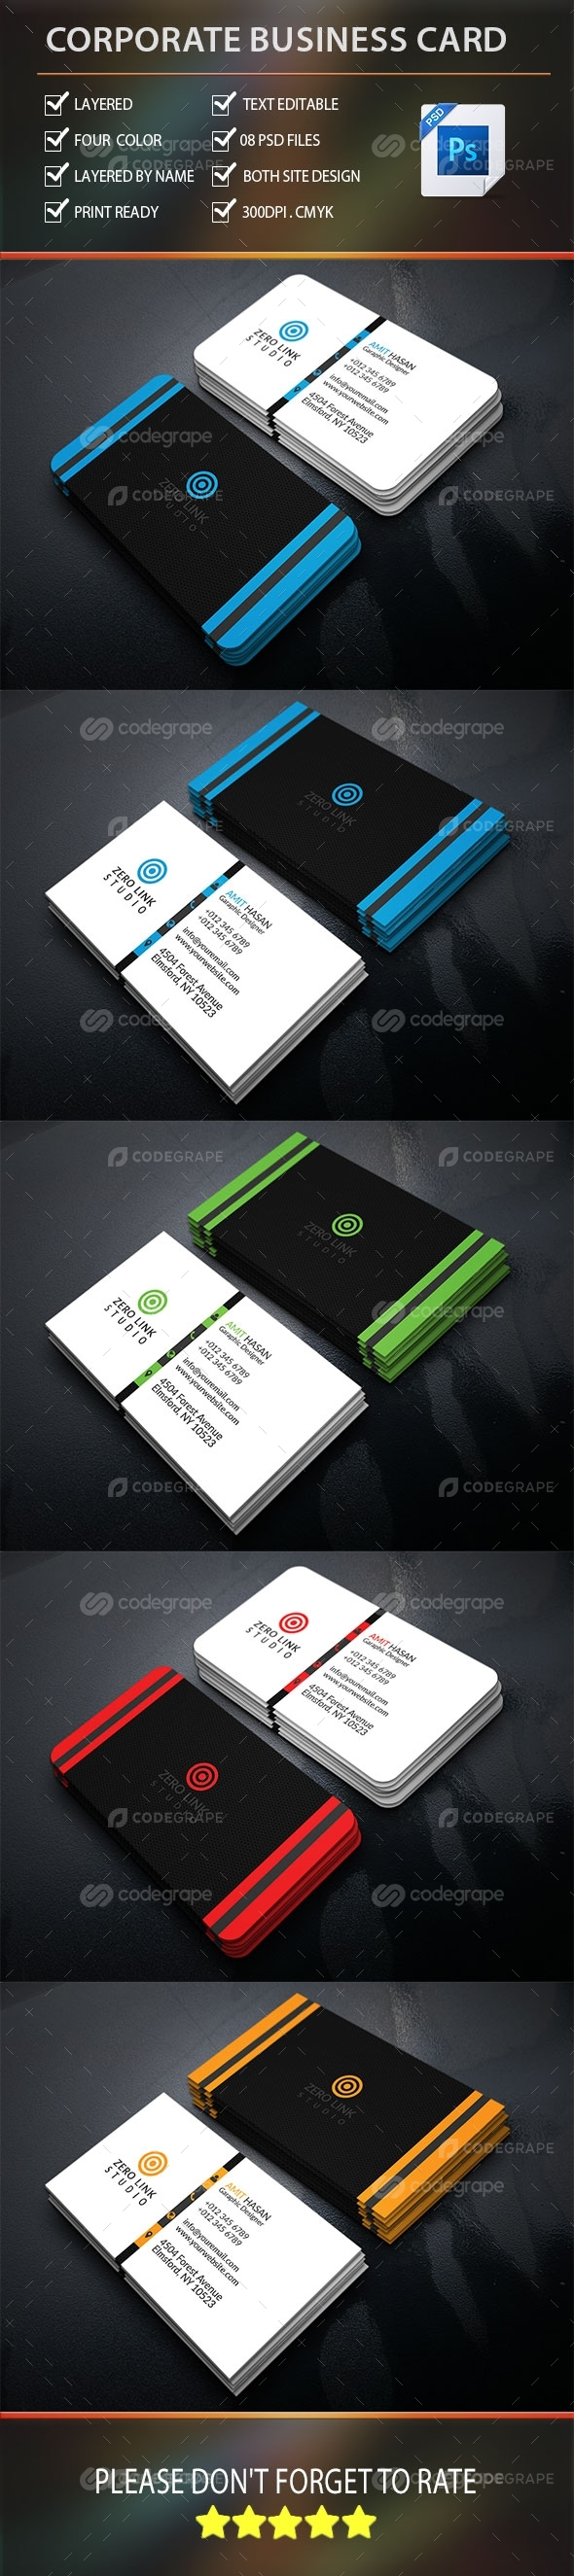 Corporate Business Card Vol-8.0